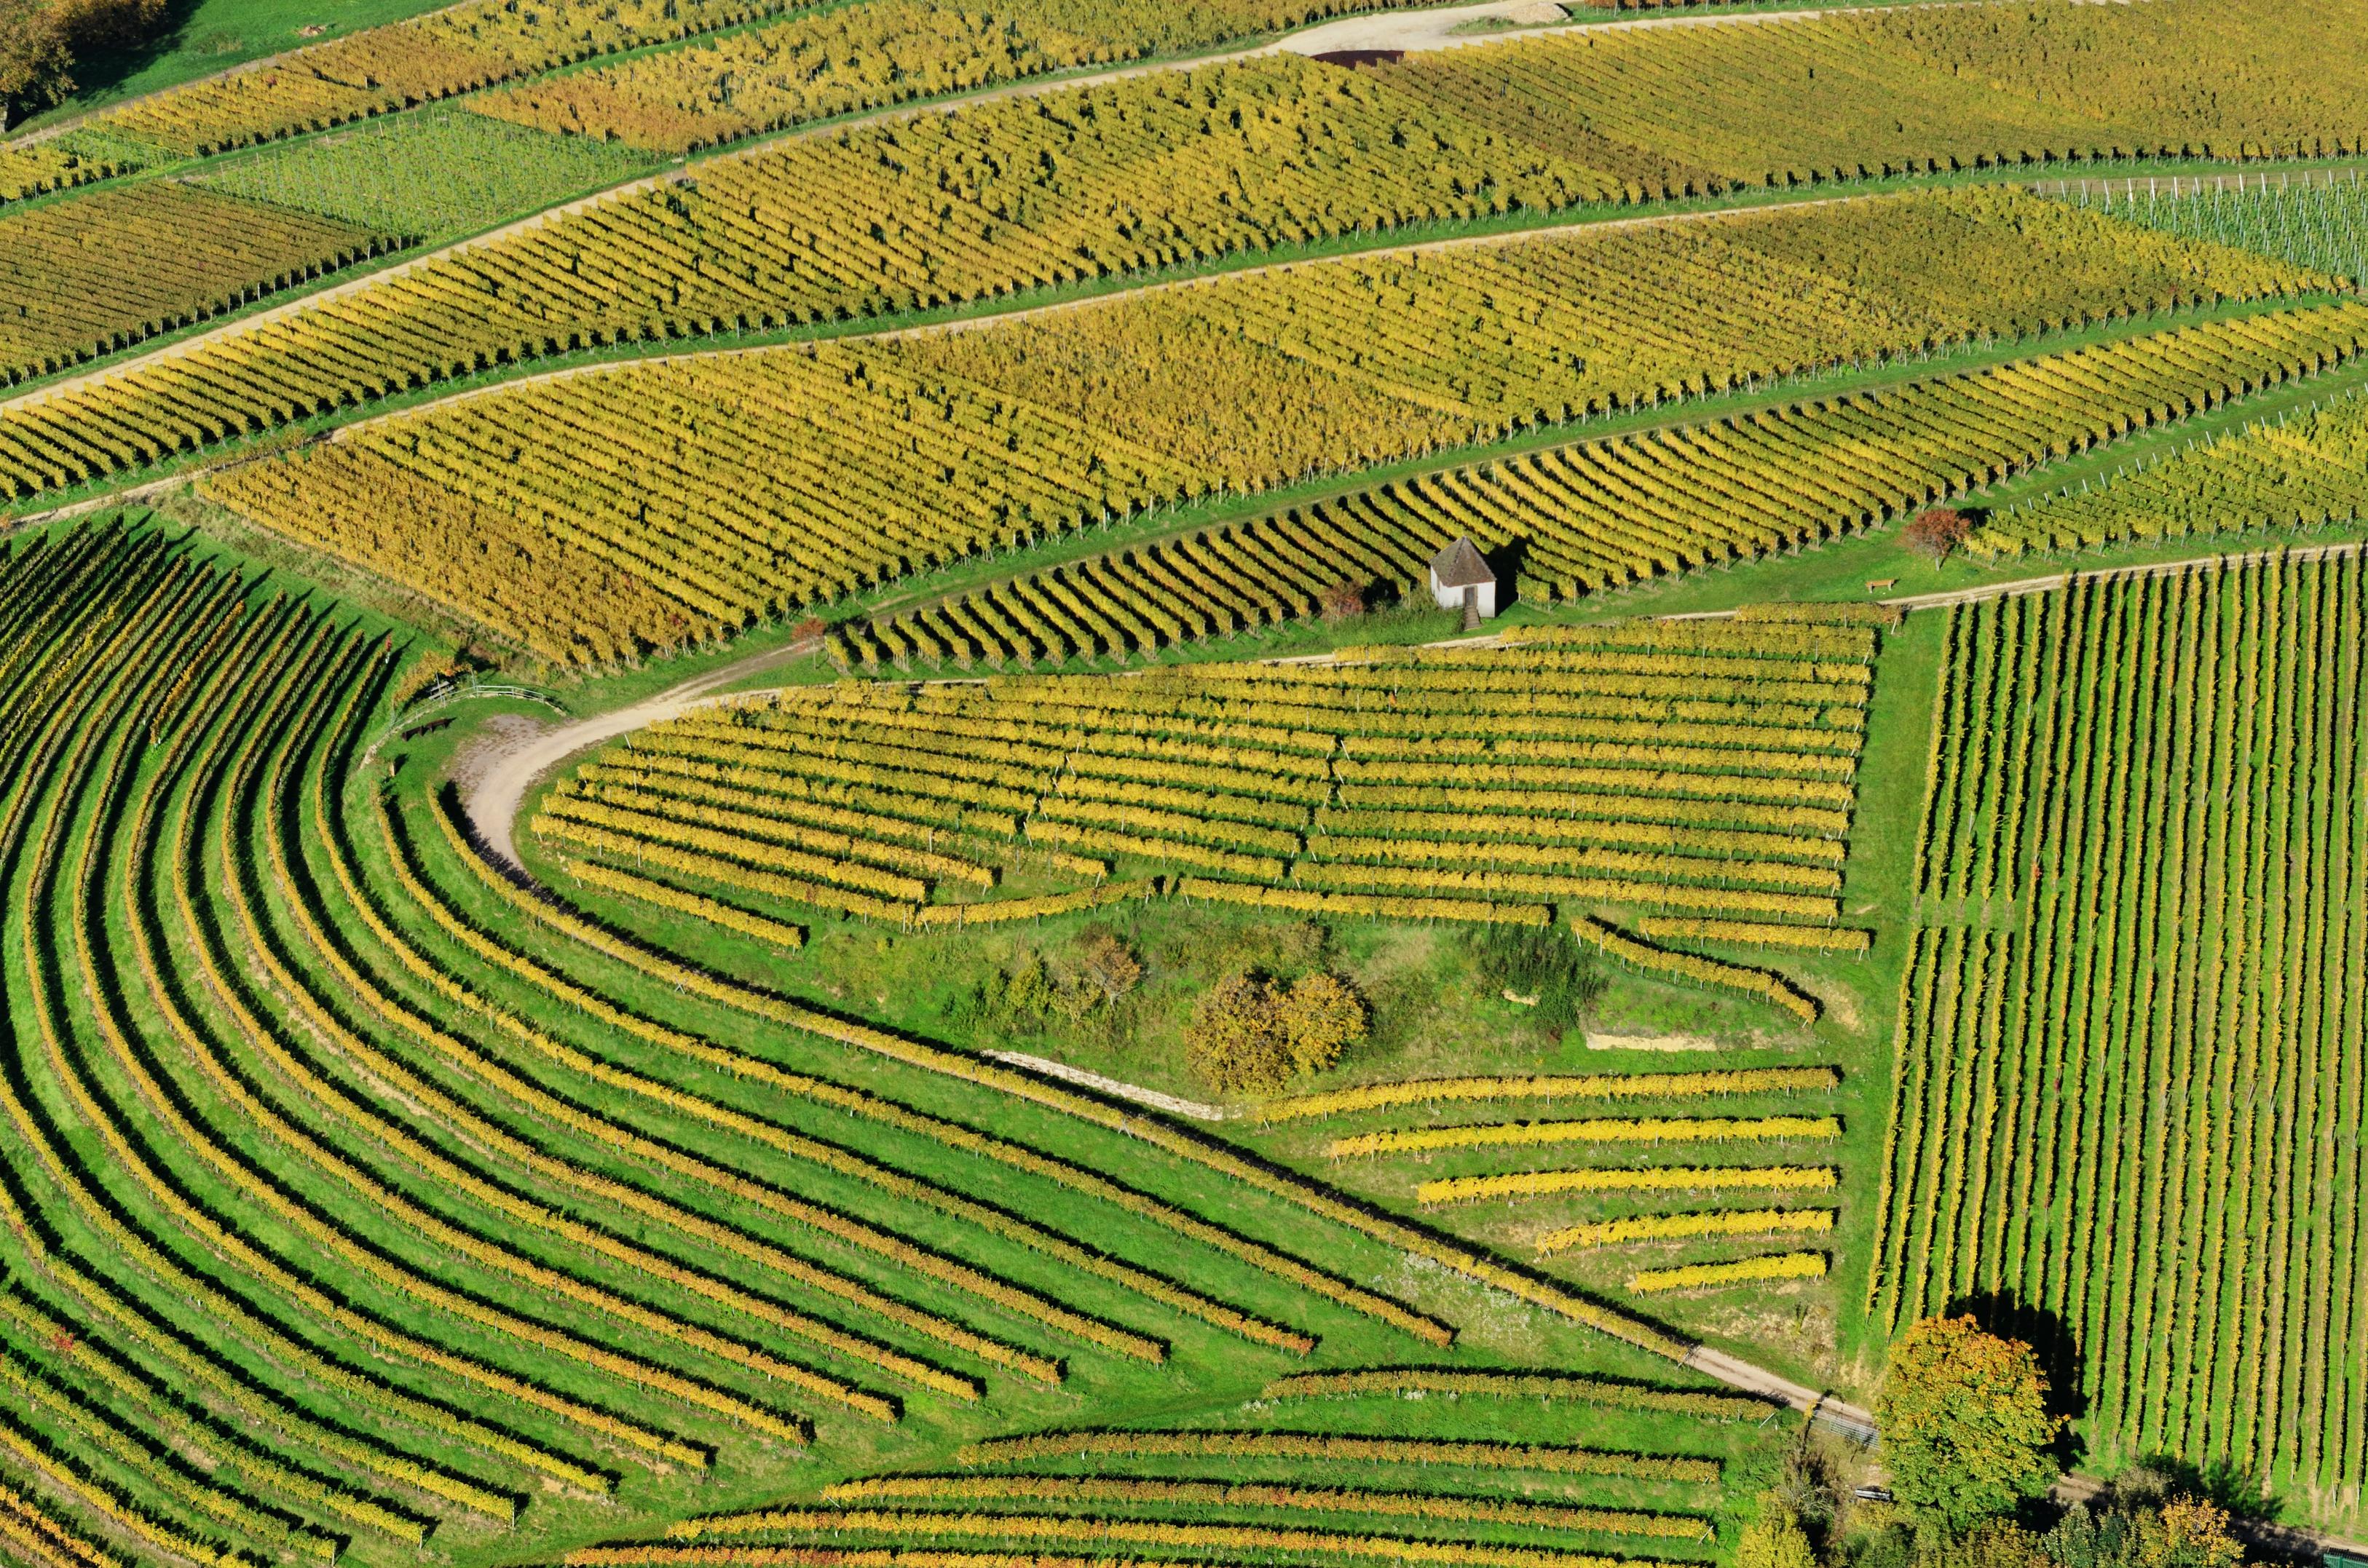 Aerial view of vineyards in Markgräflerland, Baden, Germany. Photo taken on October 21, 2012.